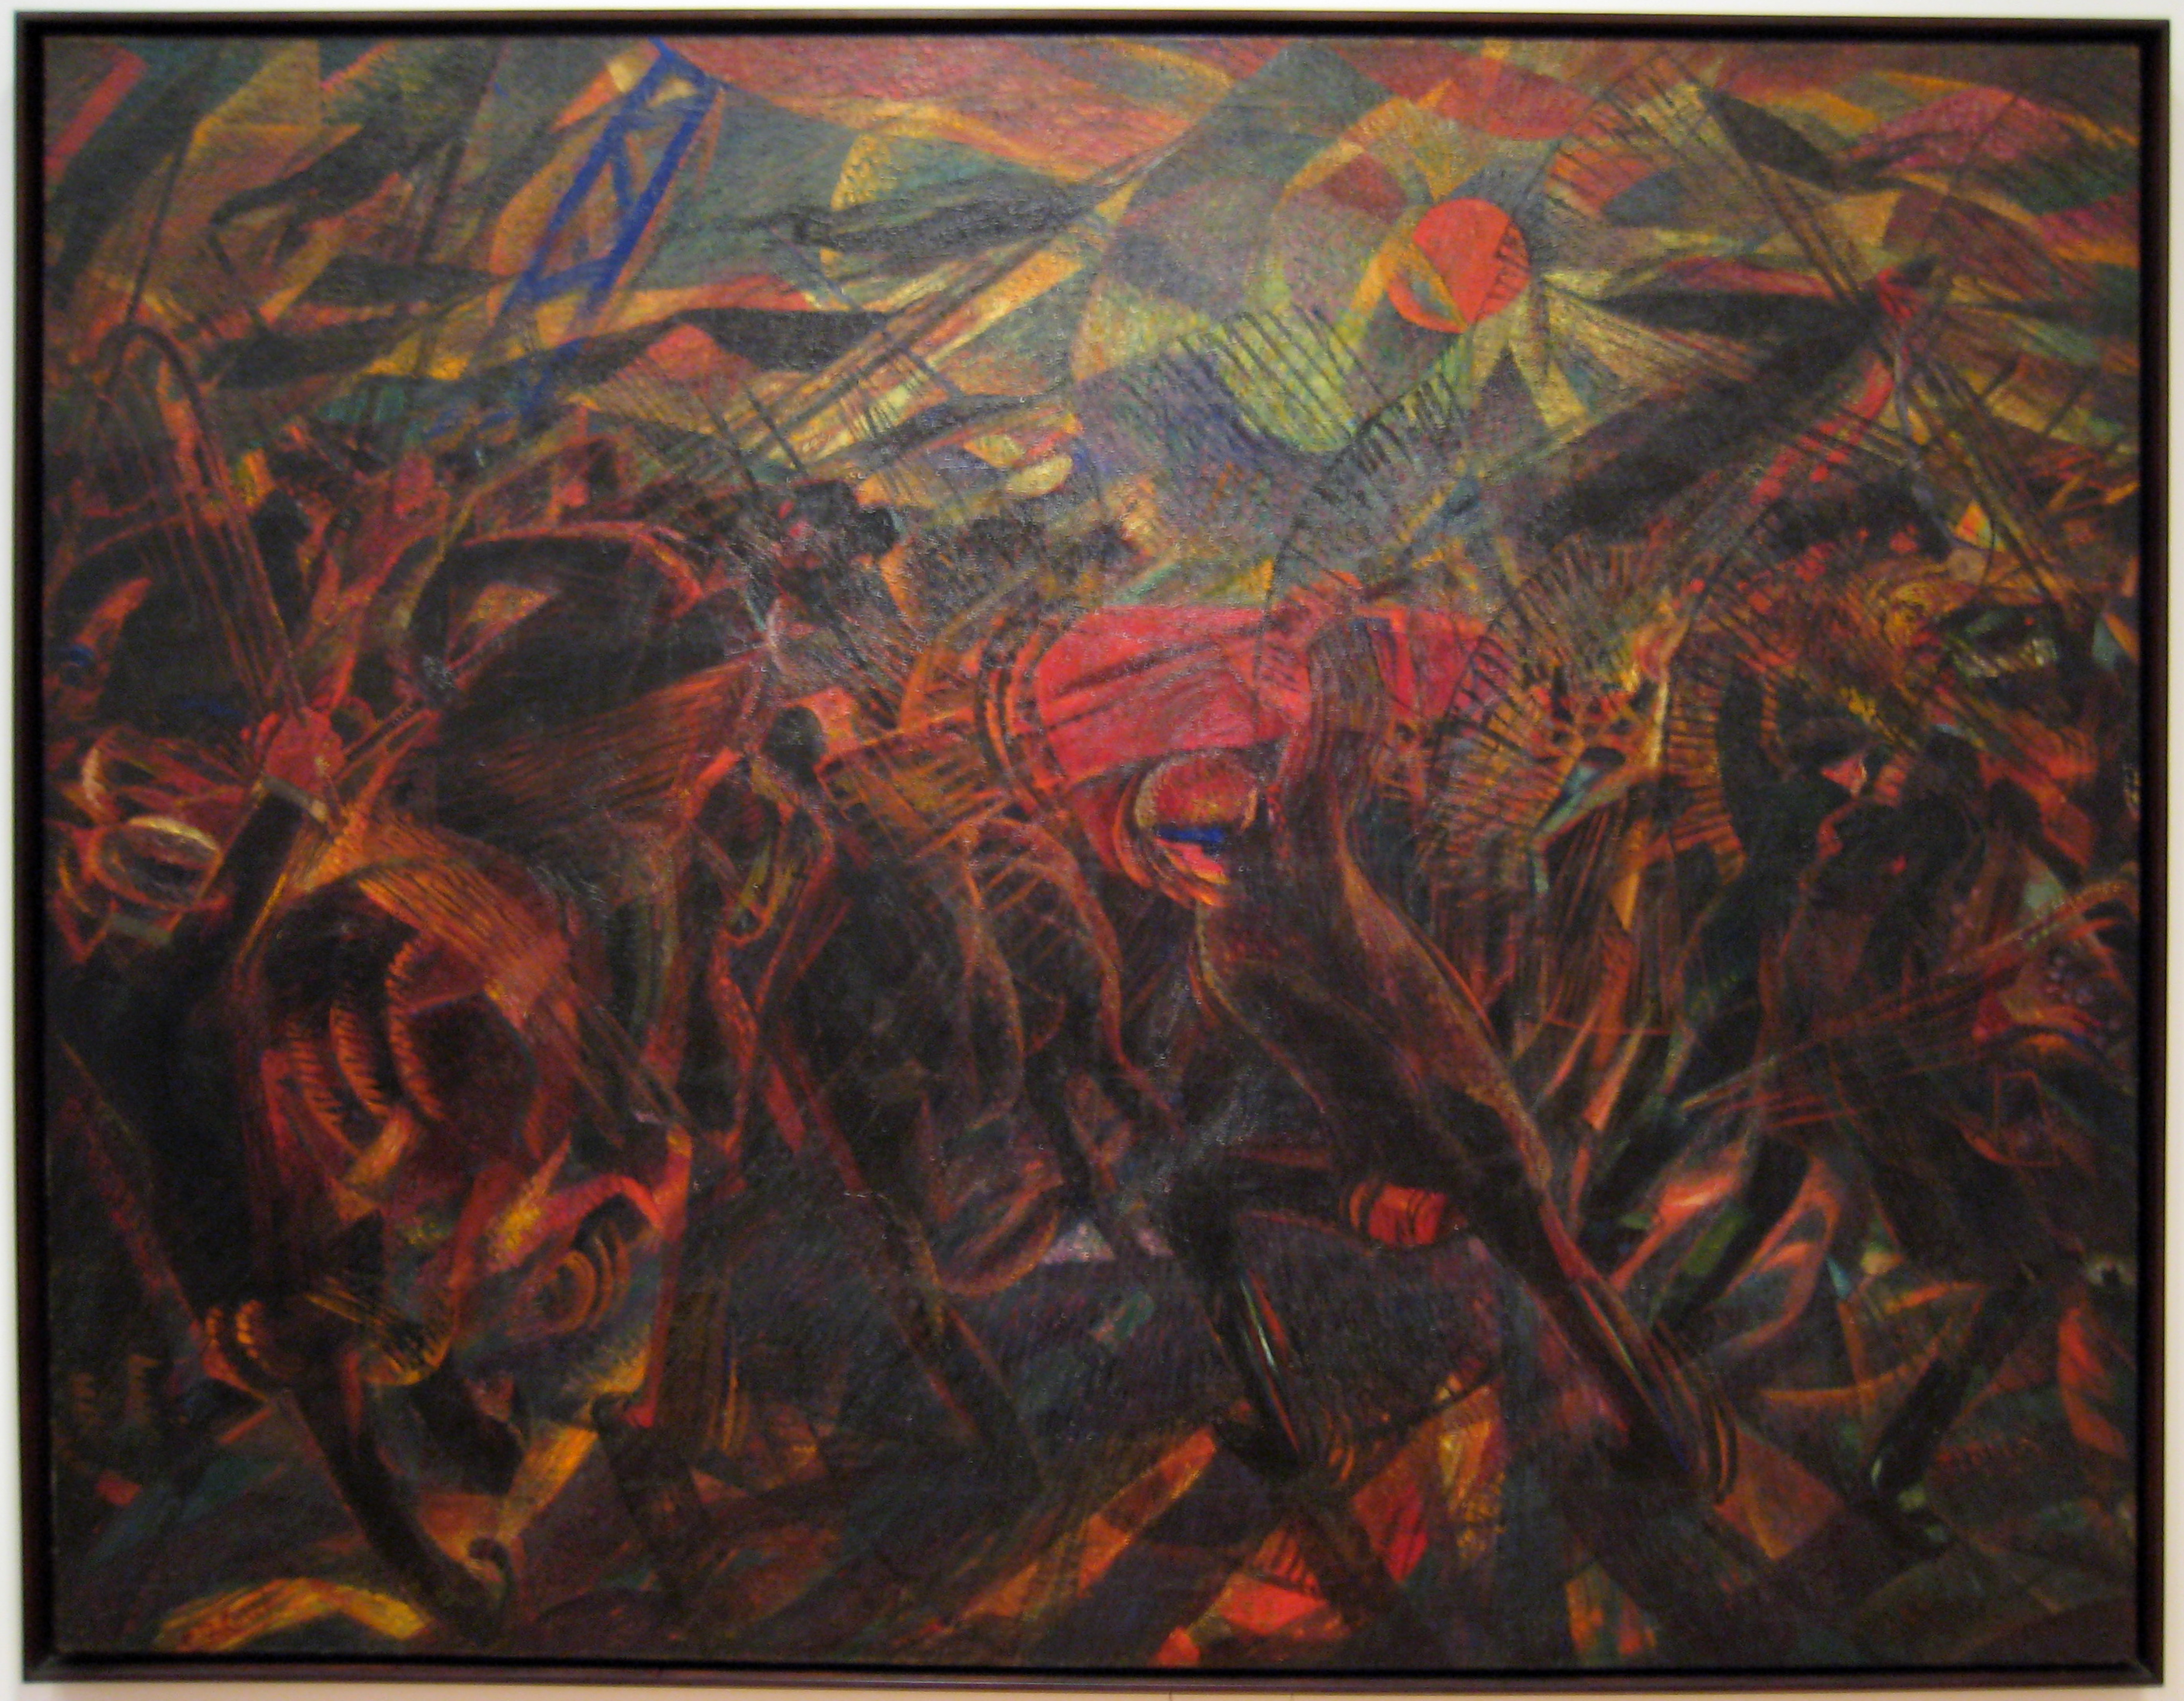 Carlo Carrà: Funeral of the Anarchist Galli (1910-11)